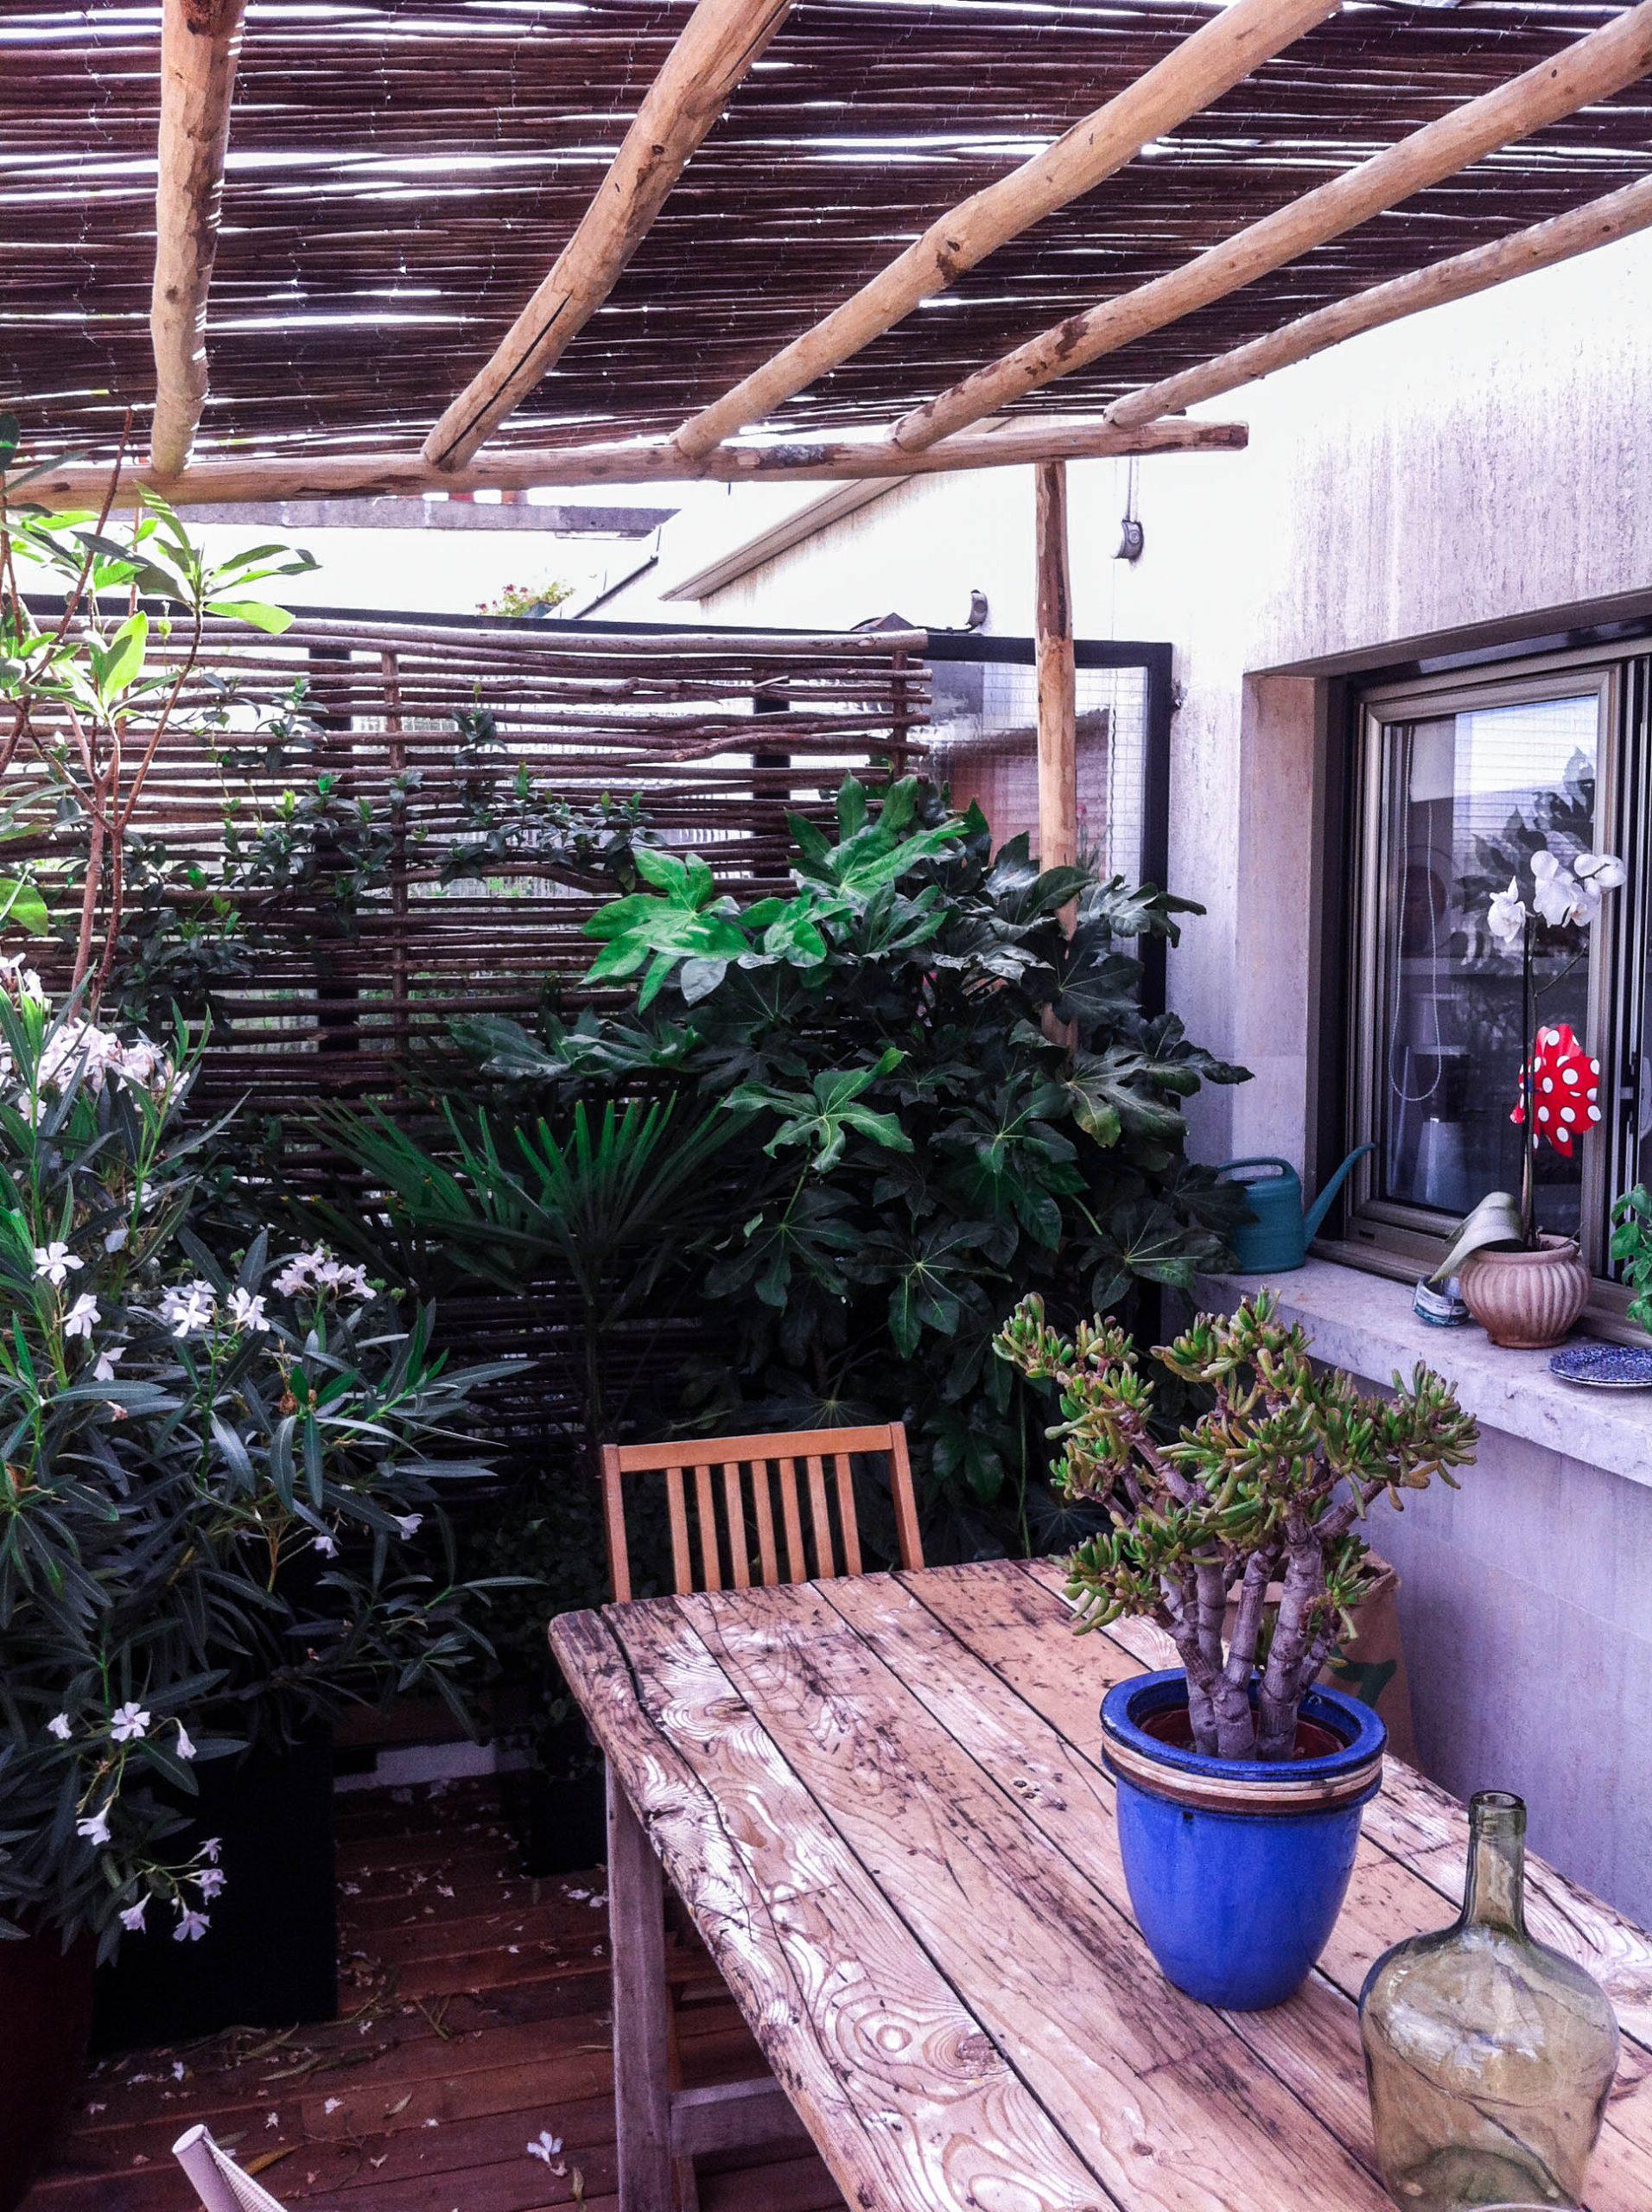 Portfolio De Swandy Wenker | 1G Solutions à Paillote Jardin